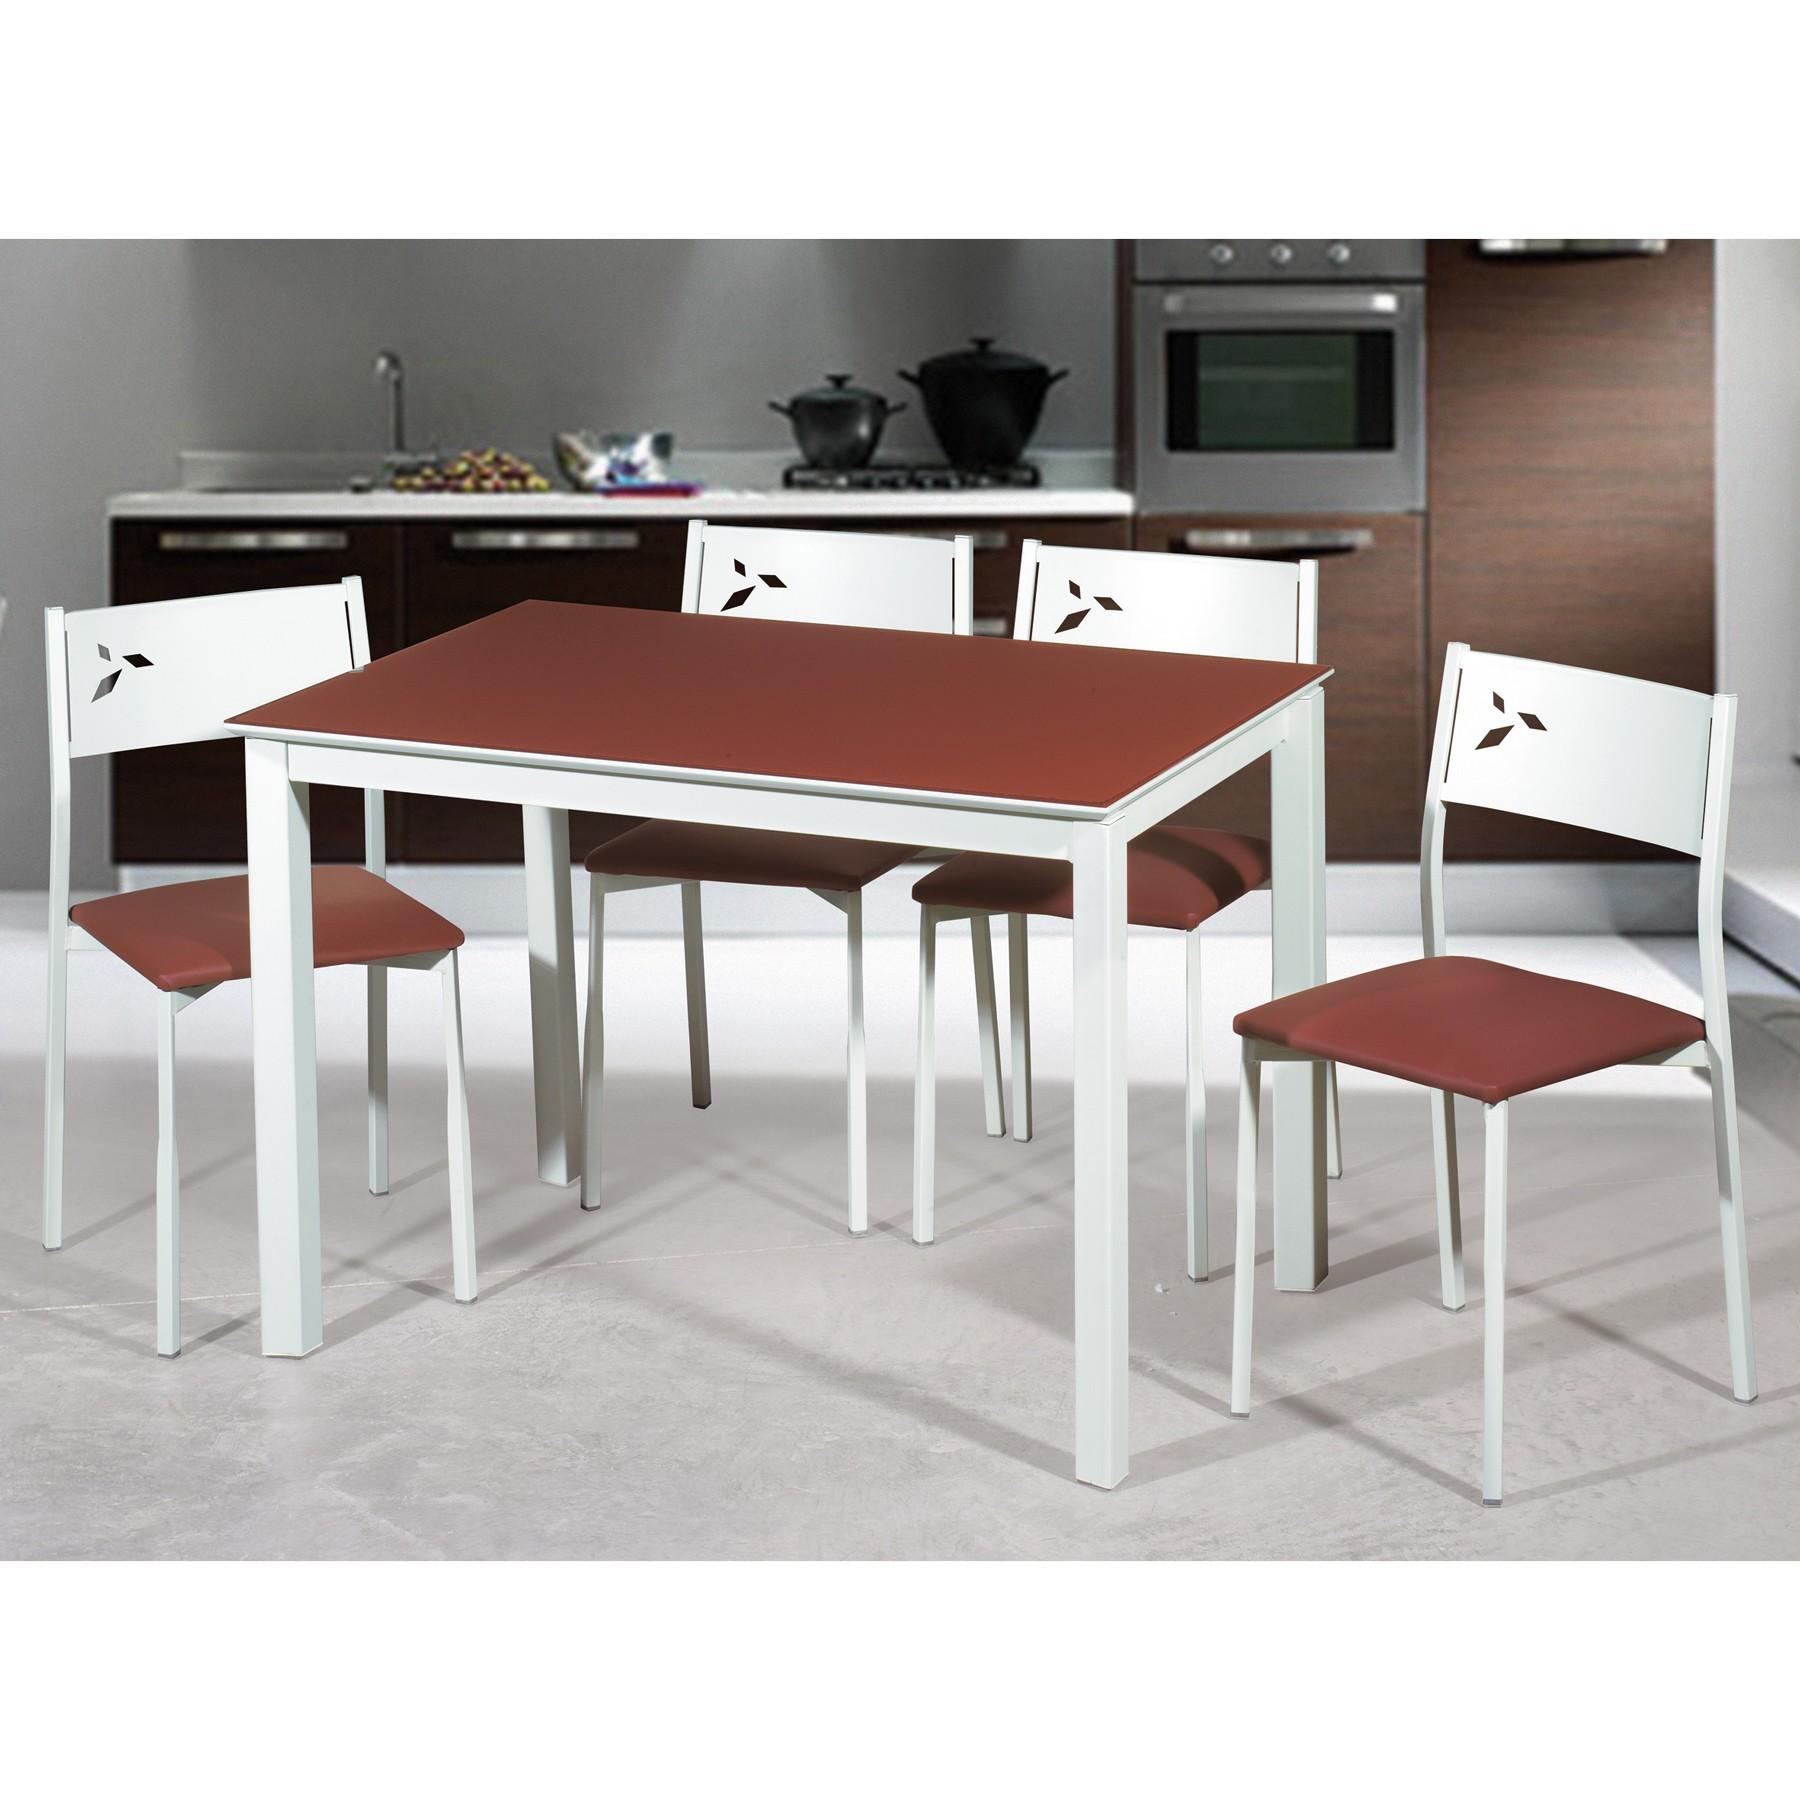 Mesa de cocina extensible plegable tres posiciones modelo Ciruela